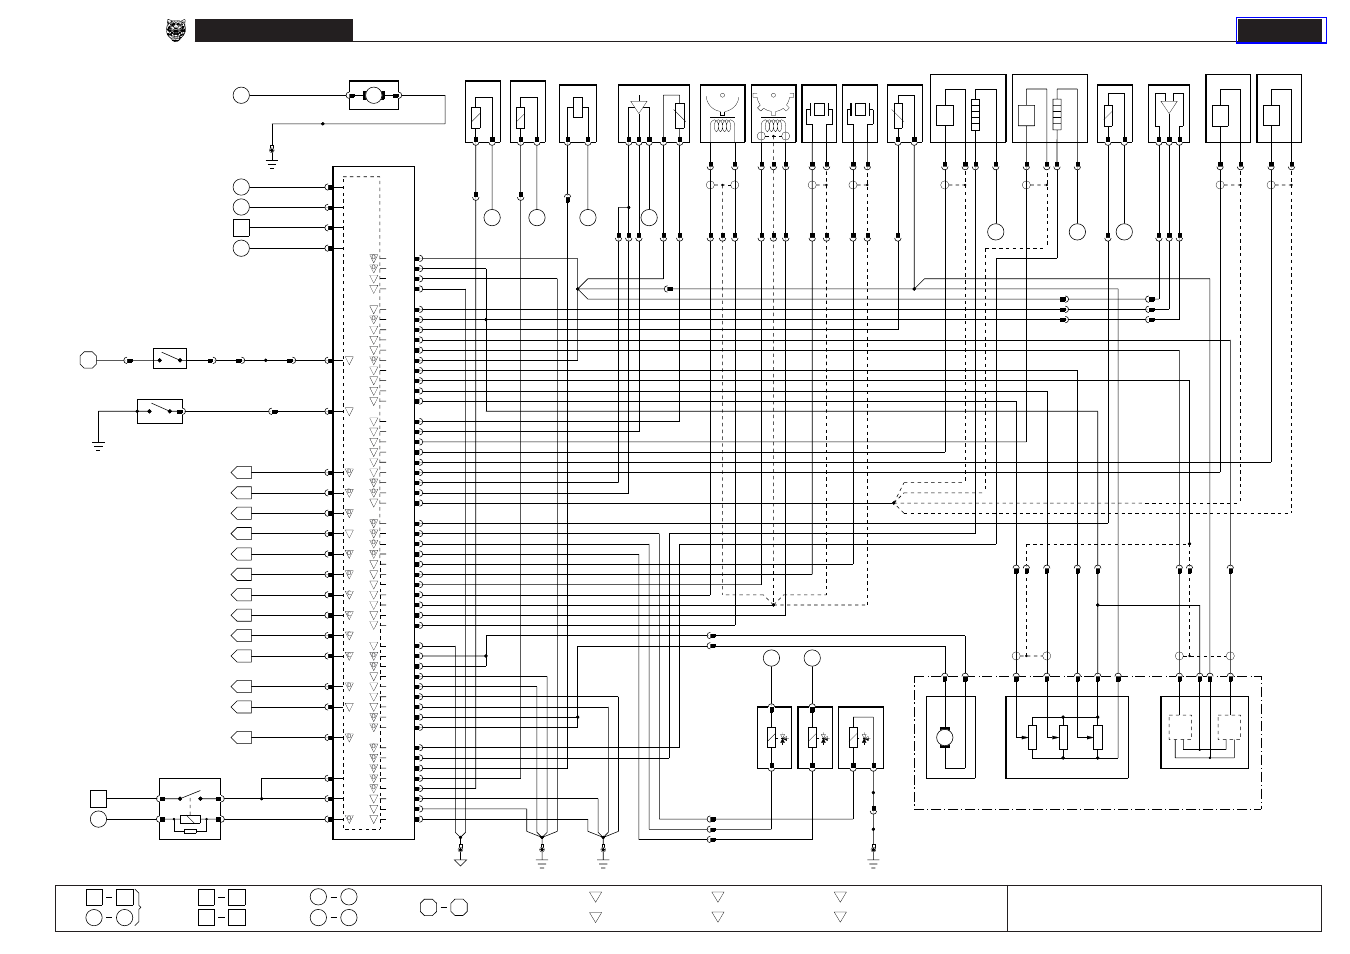 04 engine management, Engine management, Aj26 n/a nas